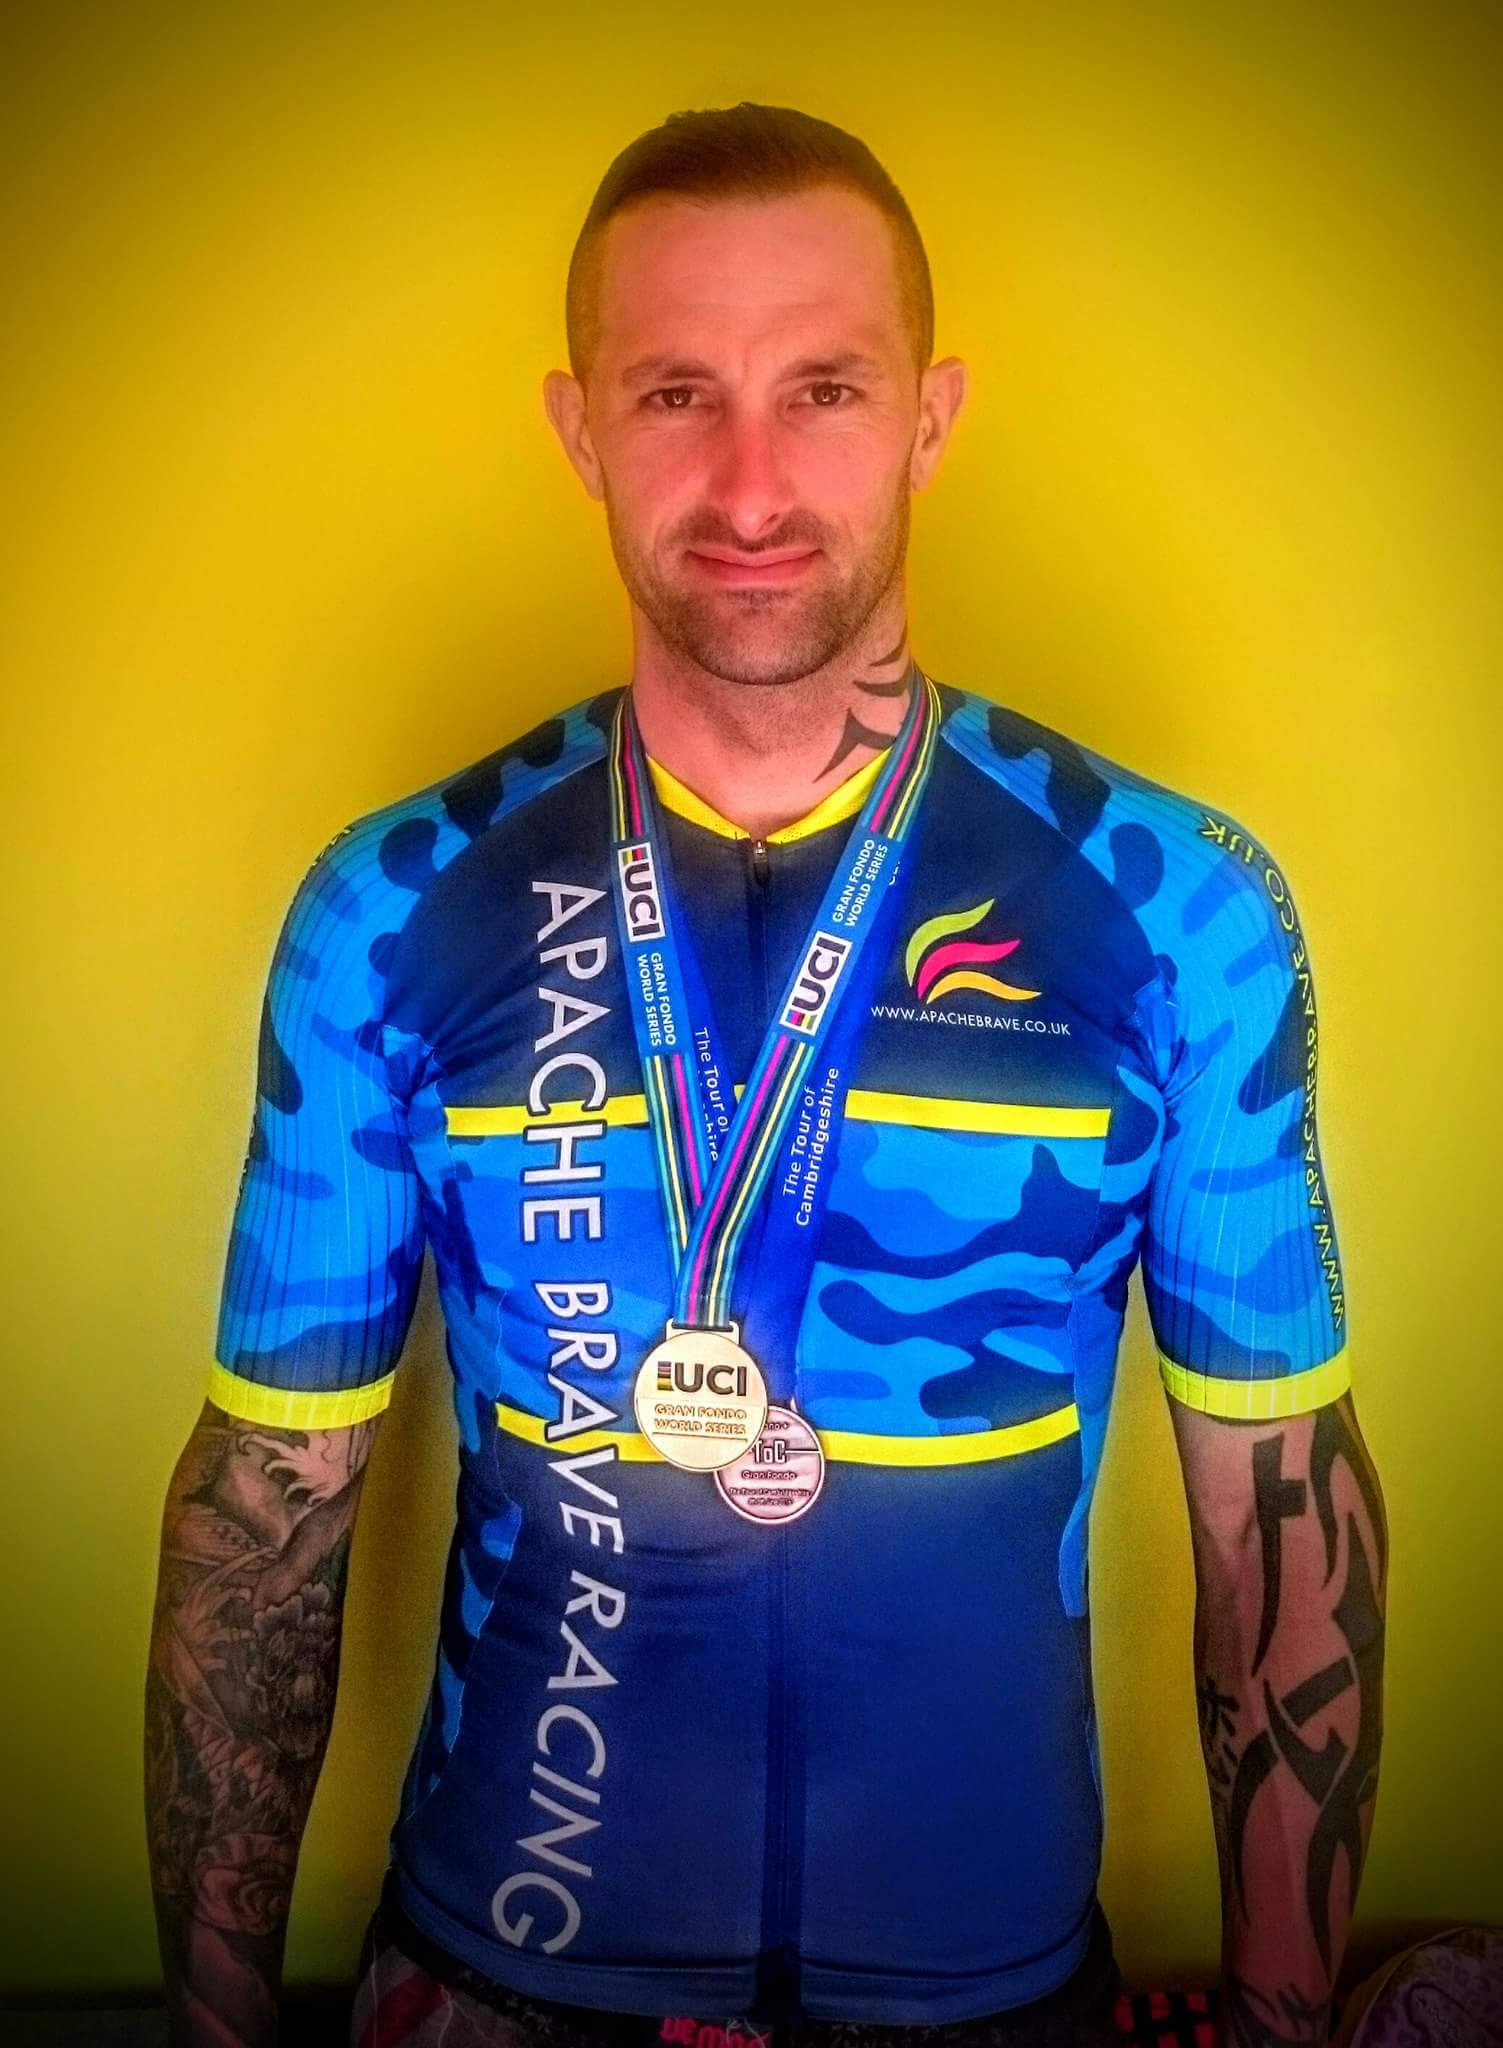 Steve Ingram Cyclist